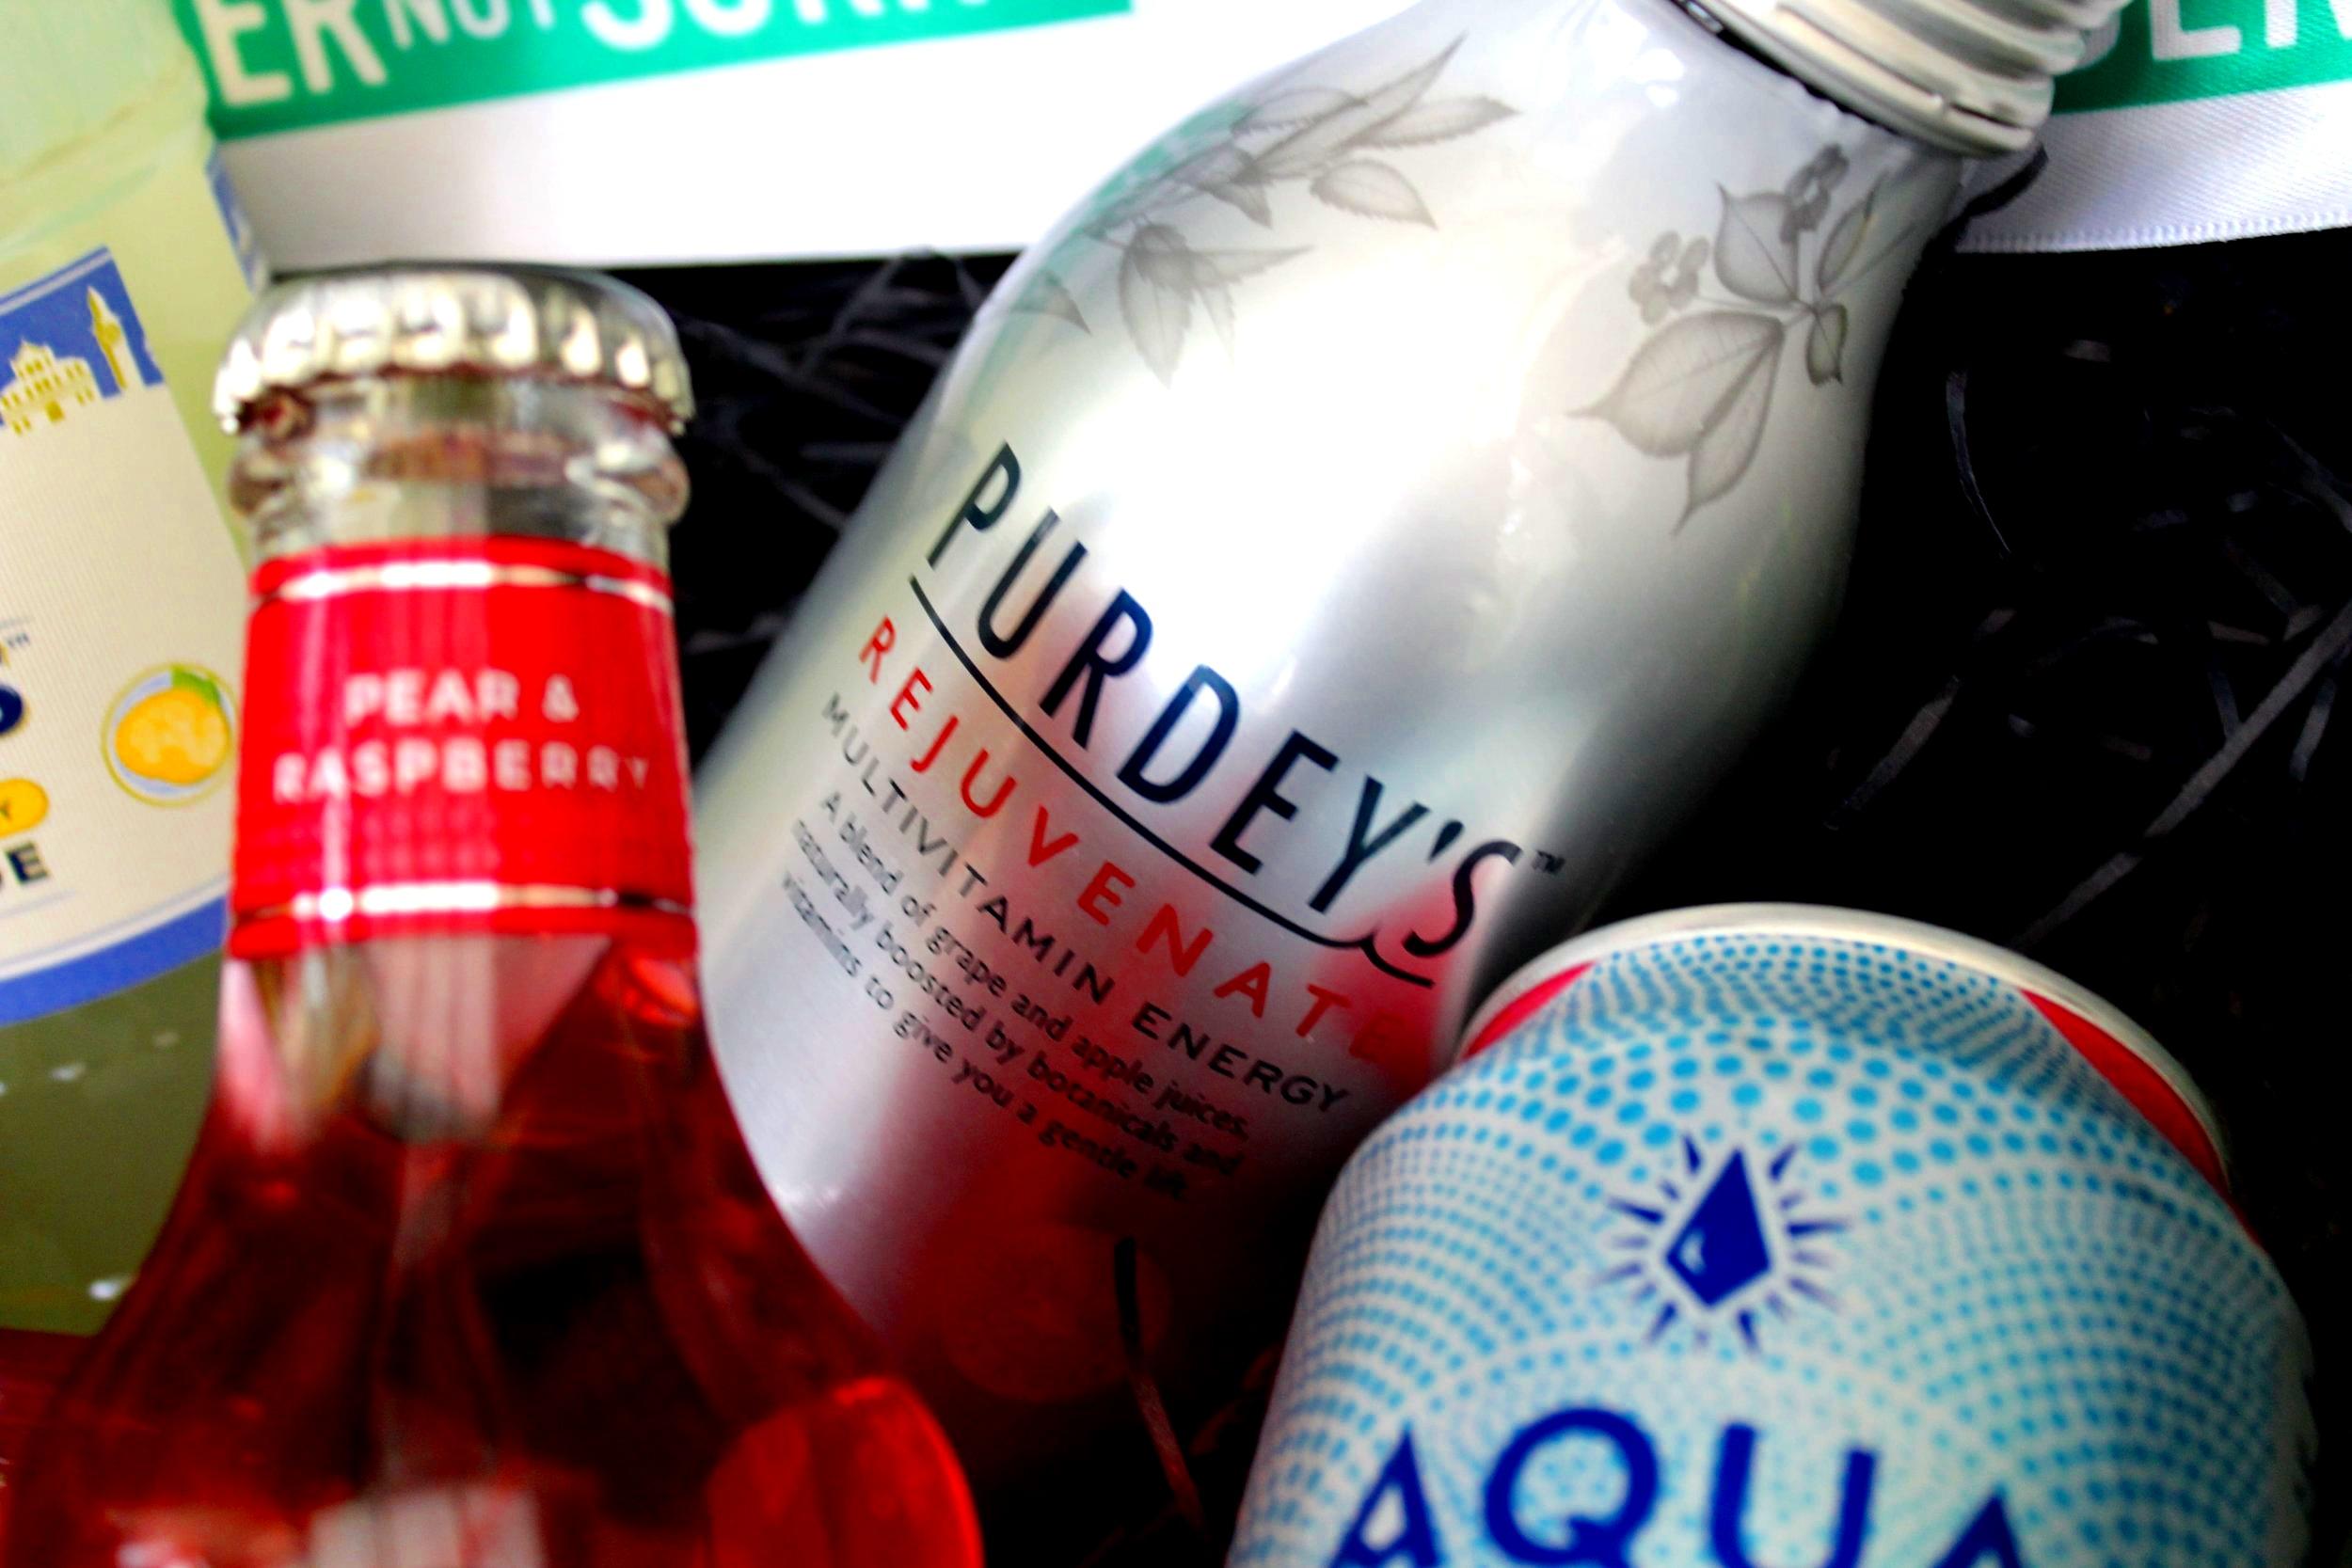 Purdey's Multivitamin Energy